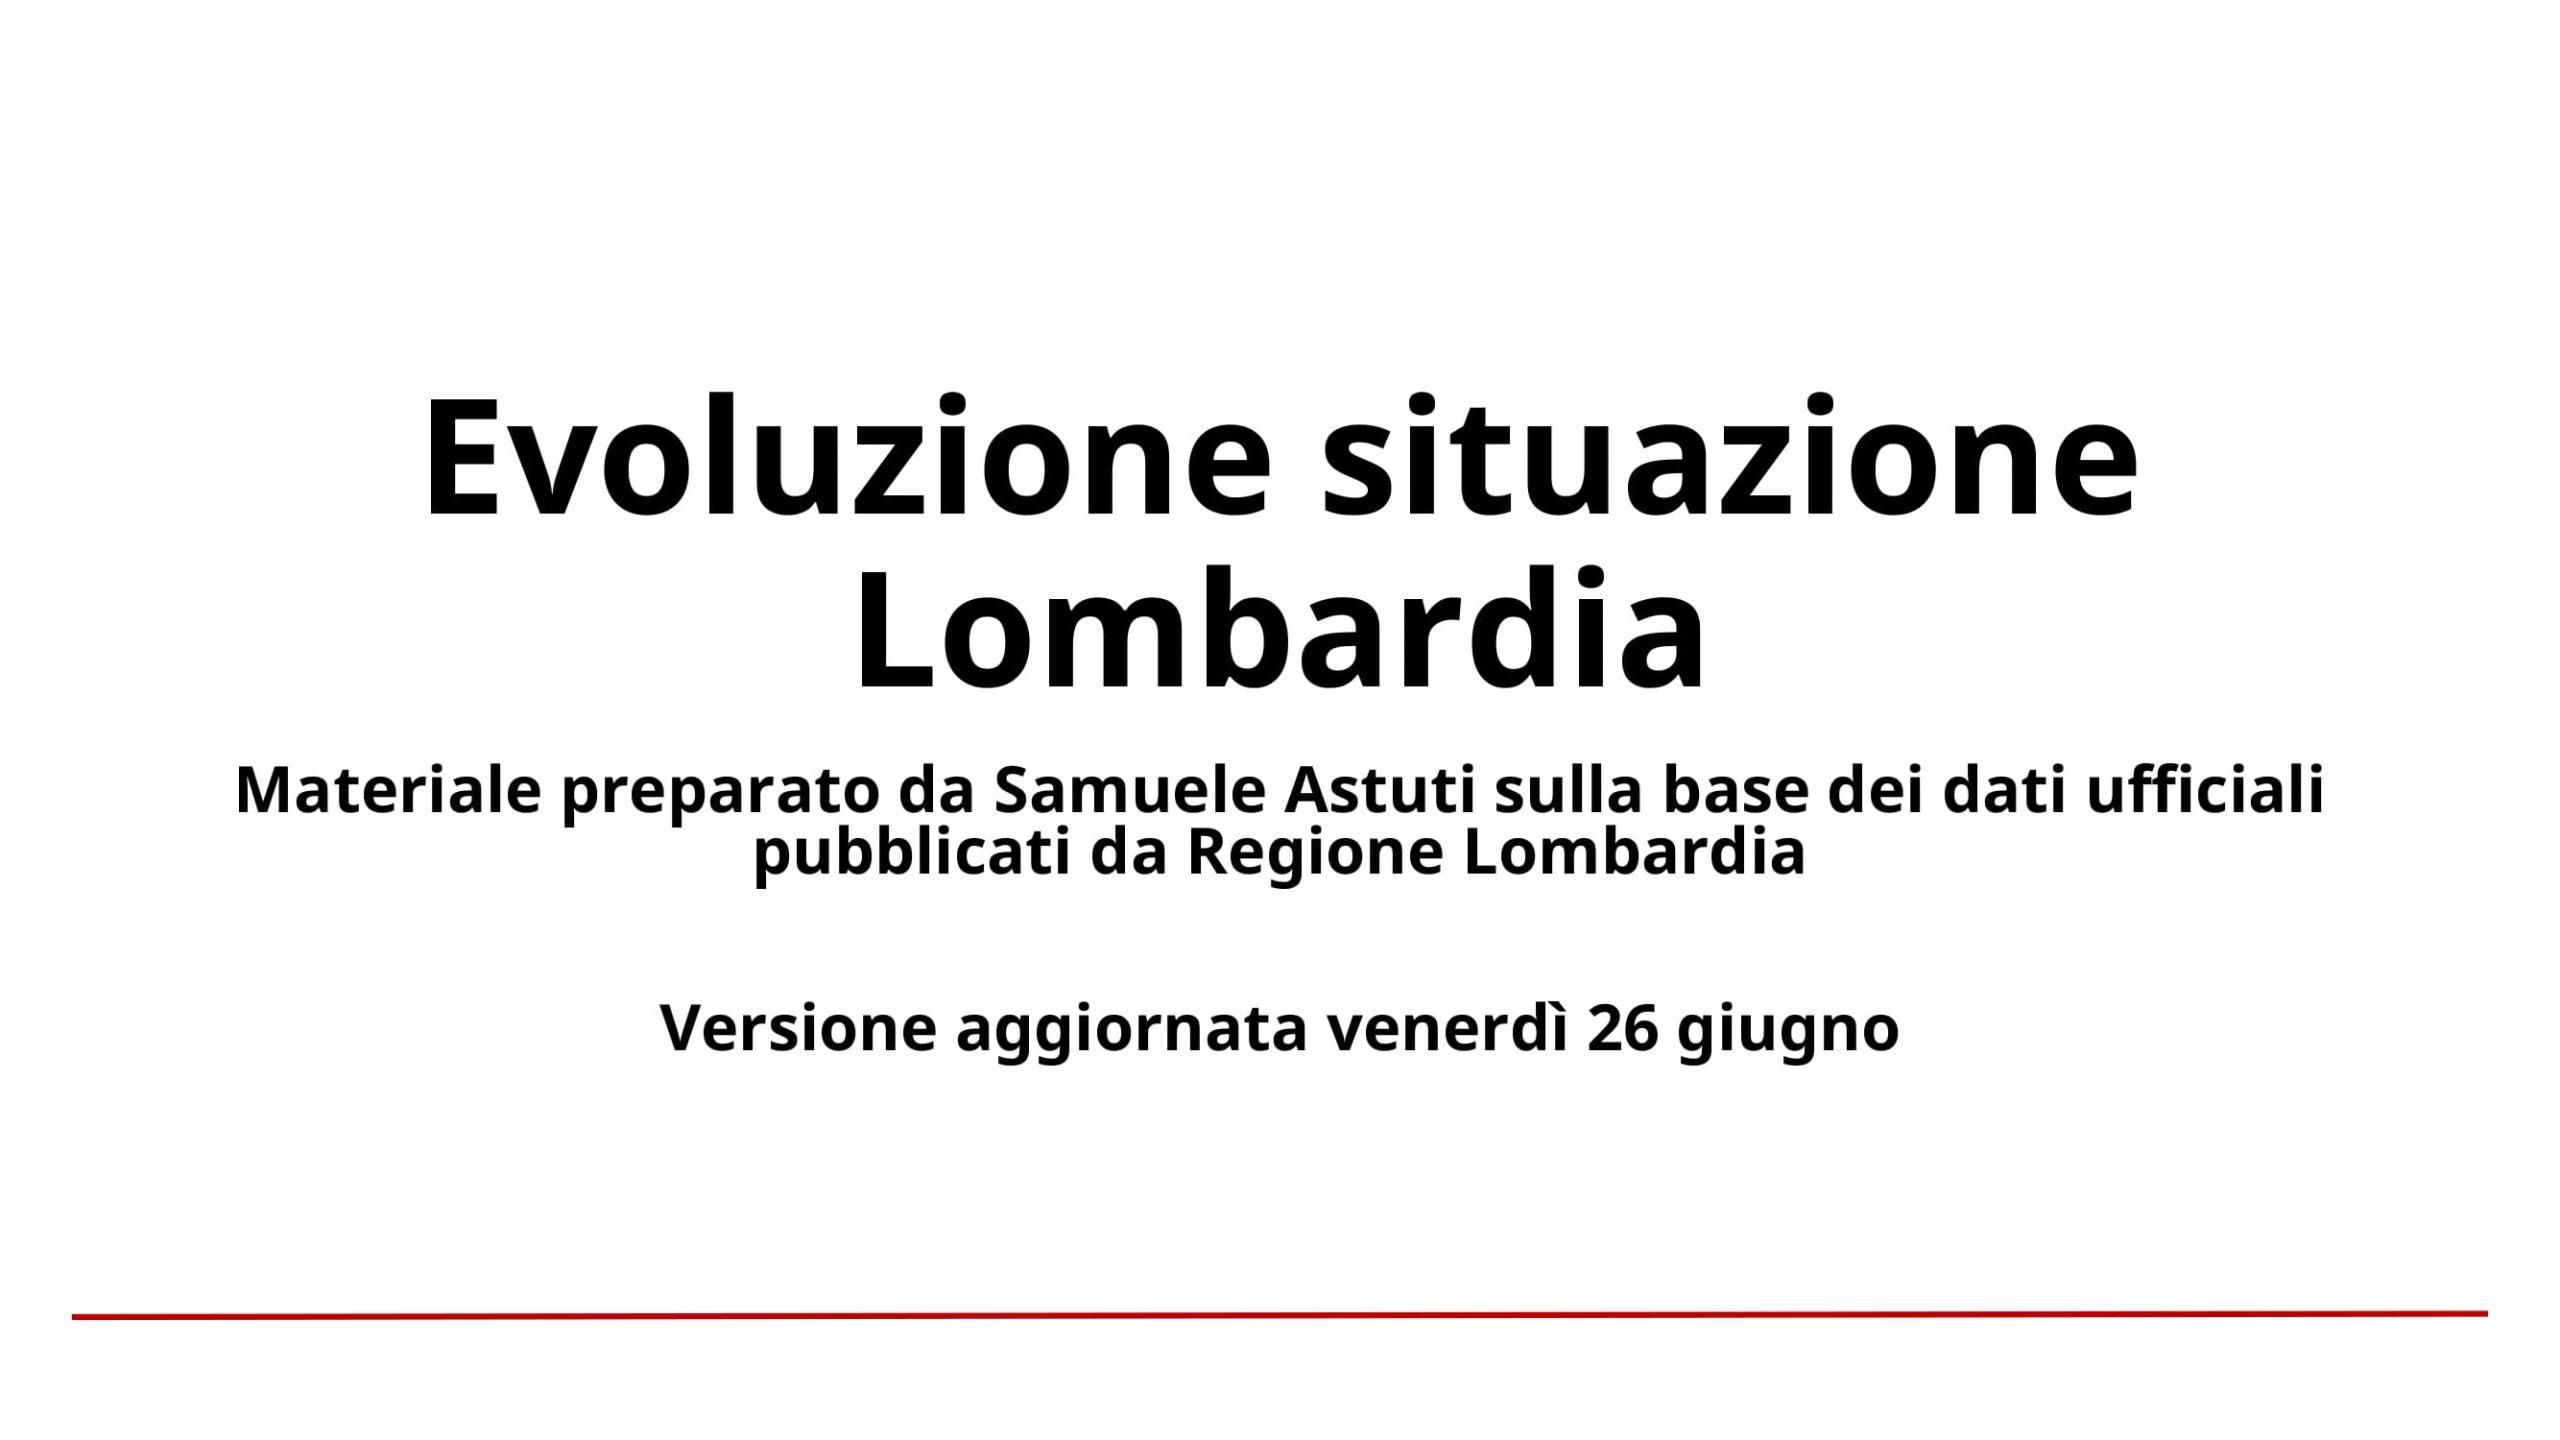 200626-EvoluzioneSituazioneLombardia-01